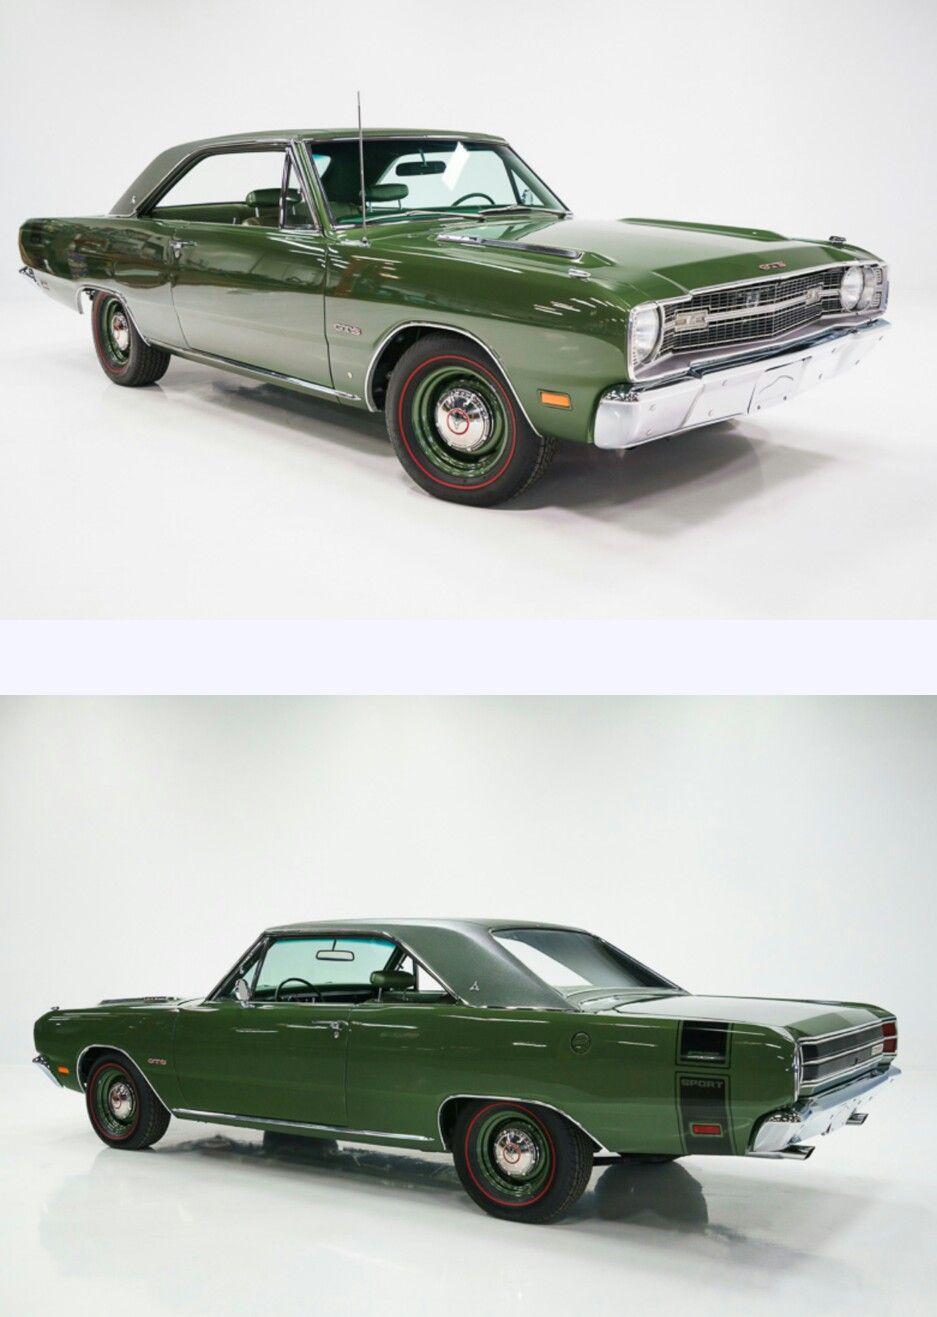 1969 Dart Gts 383 Dodge Muscle Cars Classic Cars Dodge